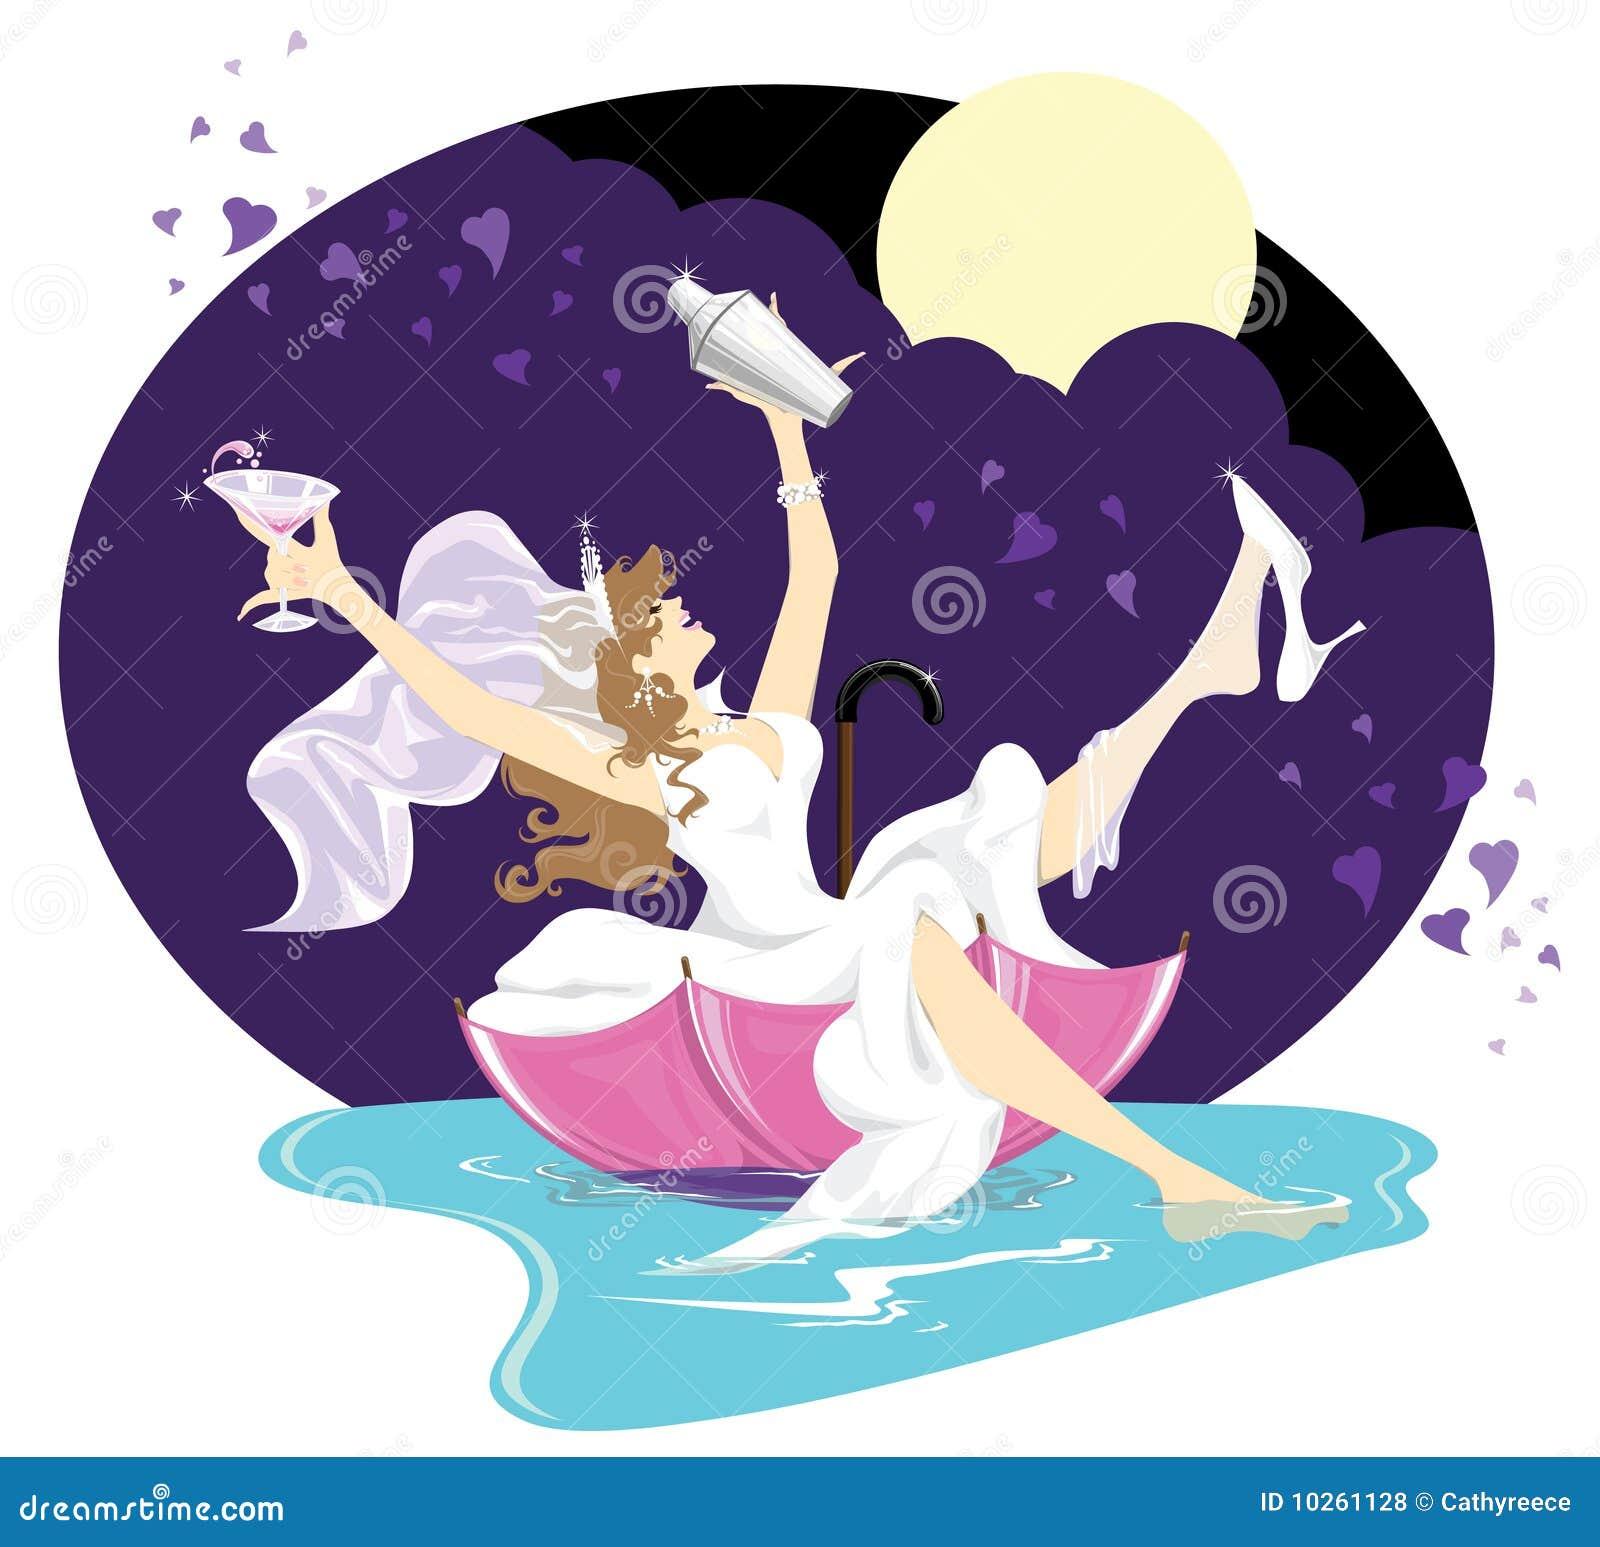 Bridal Shower Royalty Free Stock Photos - Image: 10261128